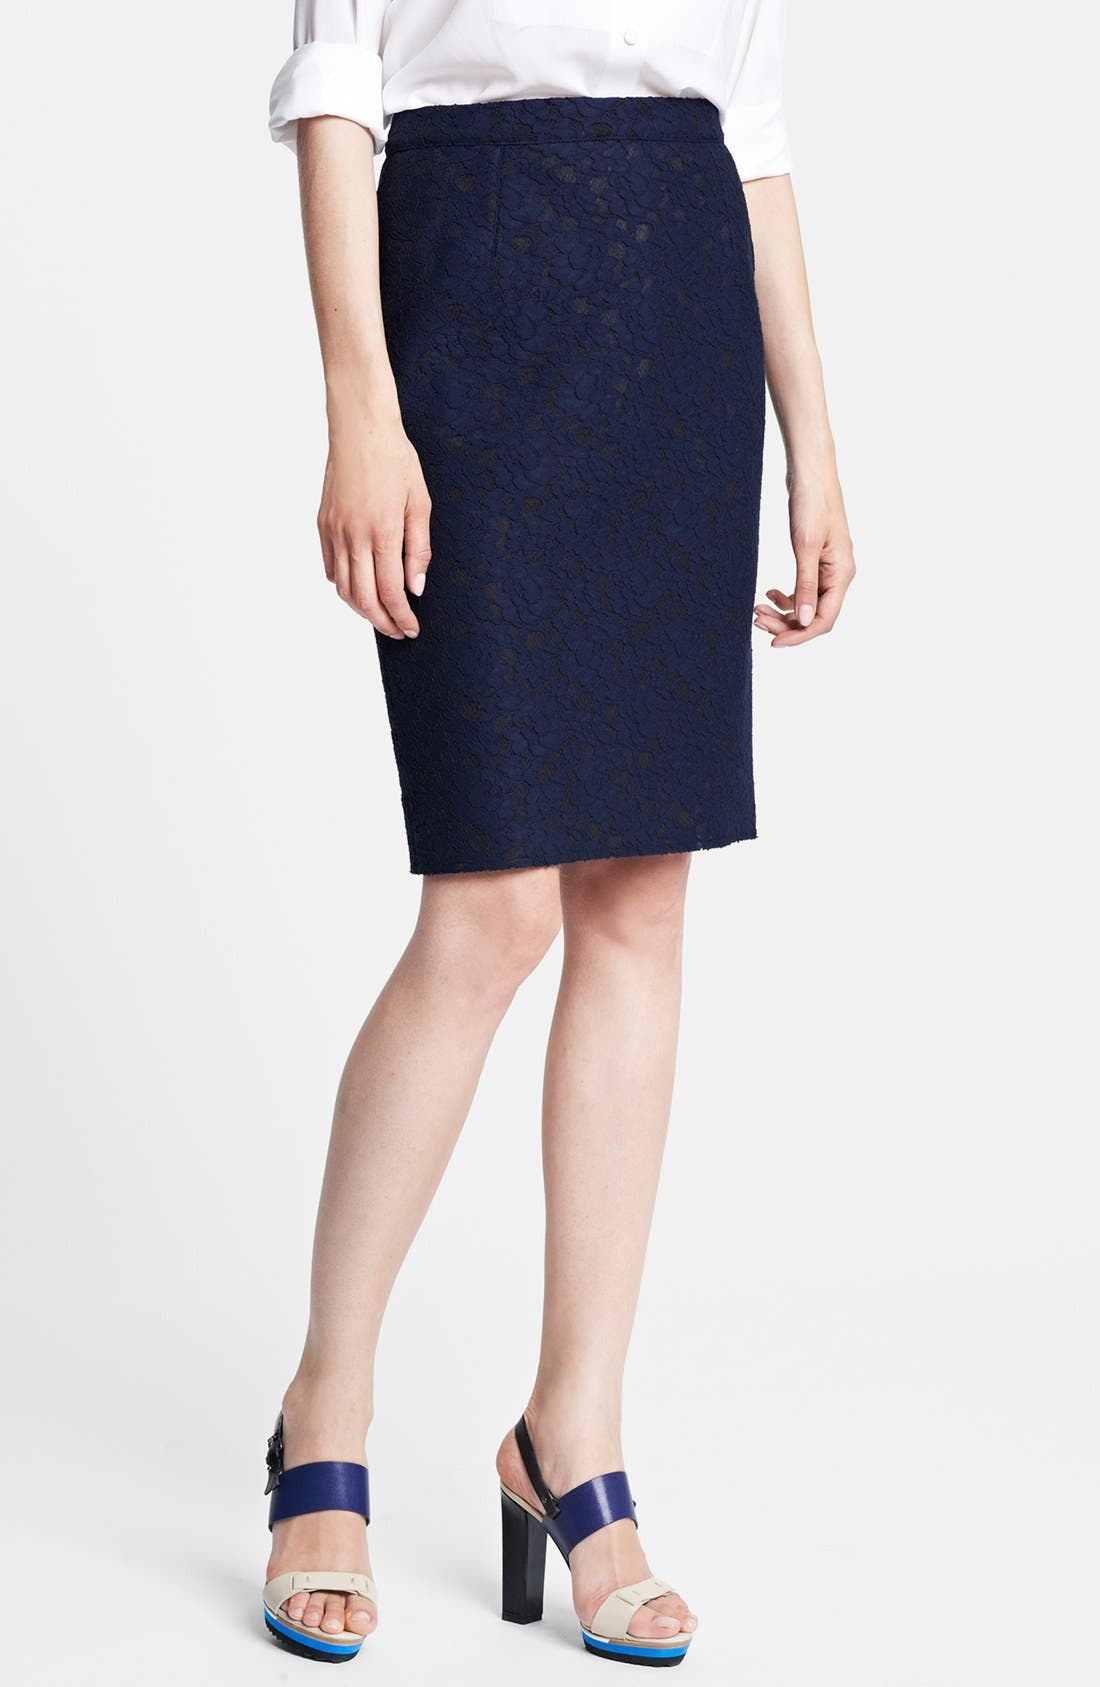 Alternate Image 1 Selected - Lanvin Floral Lace Pencil Skirt